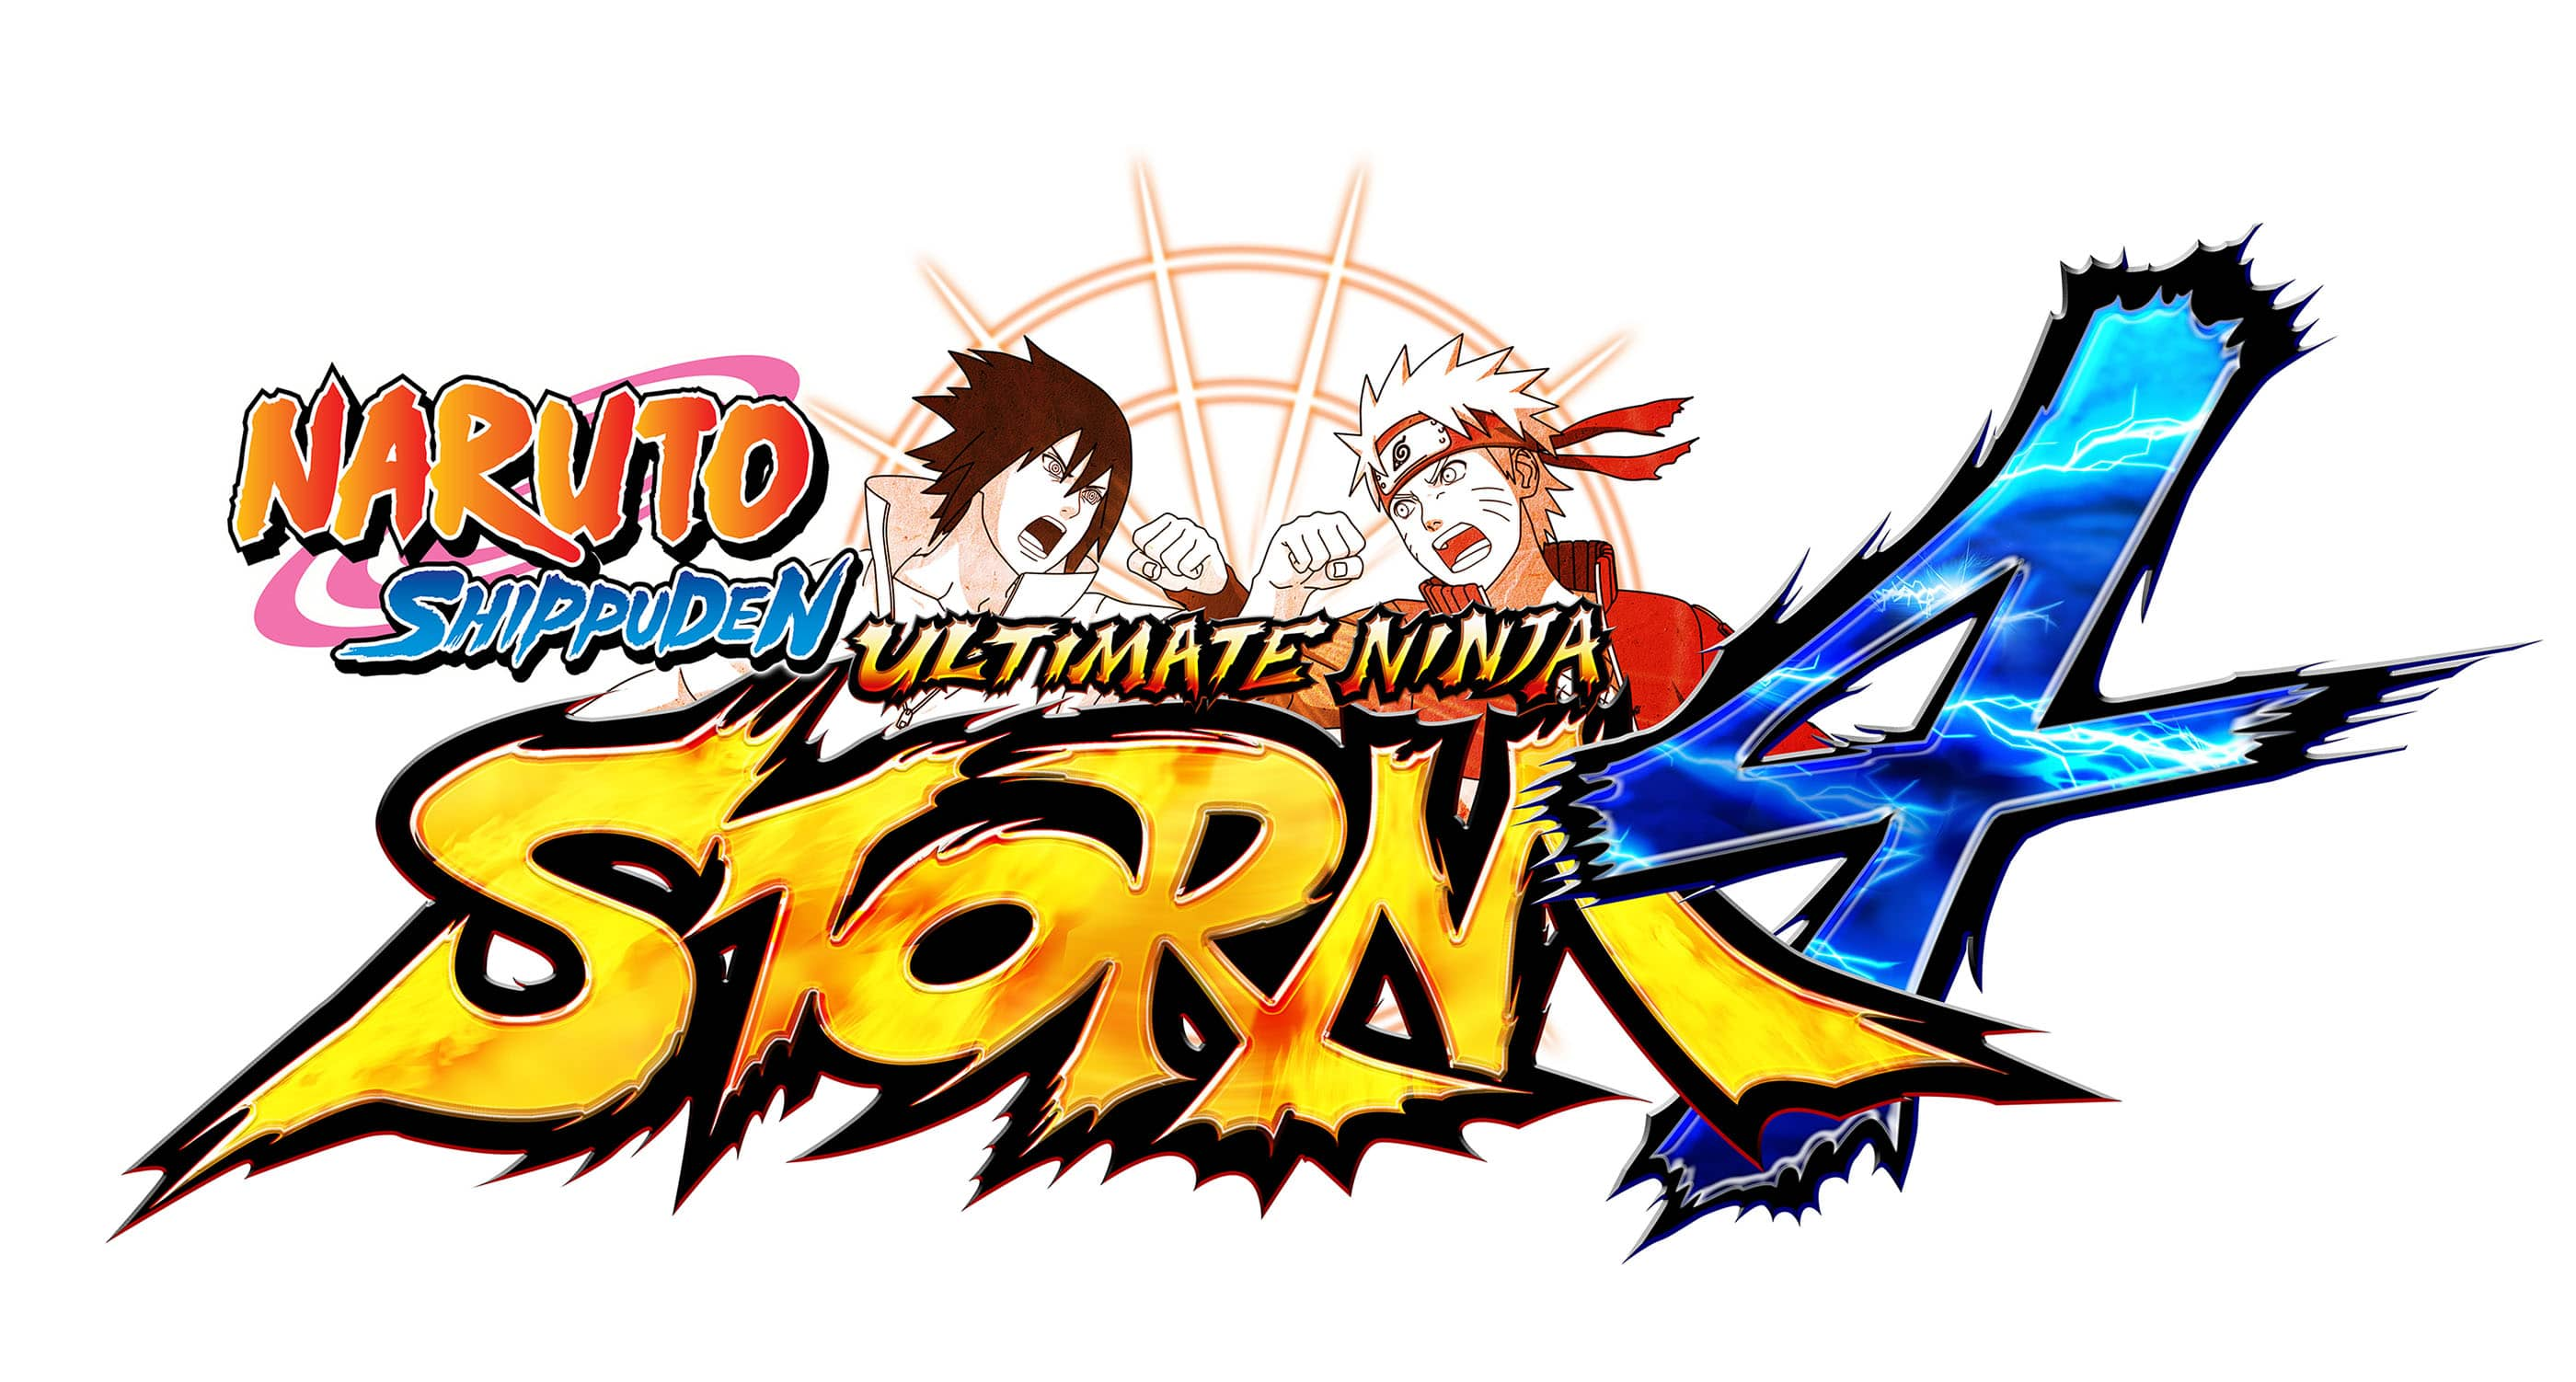 Naruto Storm 4 : Quand Obito s'énerve…